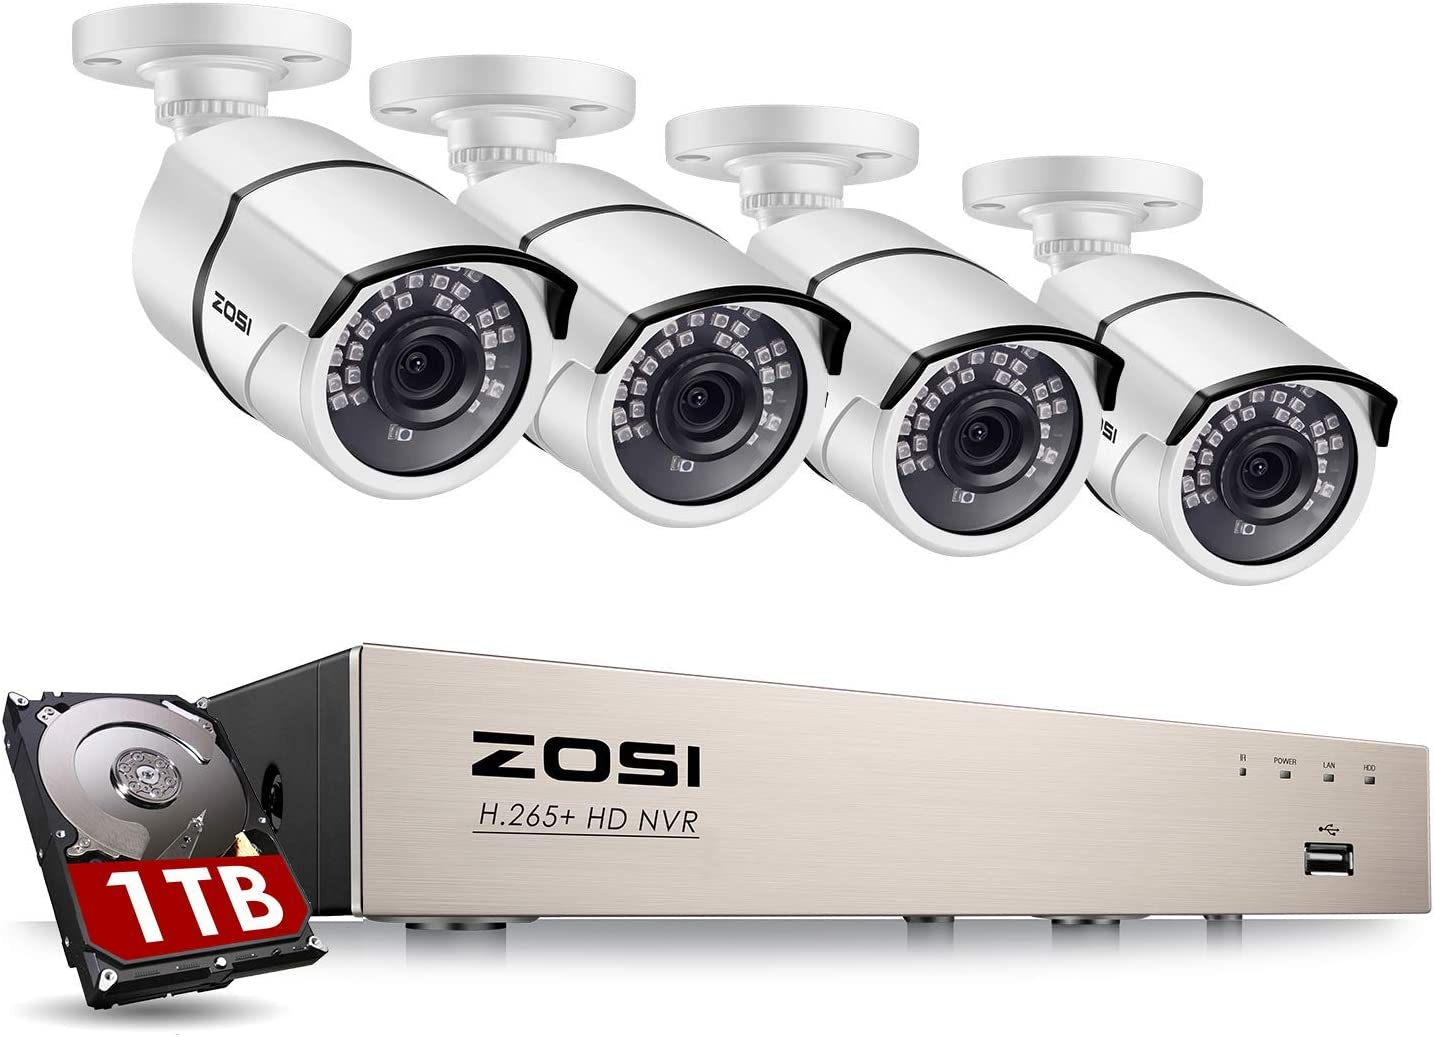 ZOSI 8CH 5MP Kit de Cámaras de Vigilancia PoE H.265+ PoE NVR + (4) Cámara de Seguridad Exterior + 1TB Disco Duro, 30M Visión Nocturna